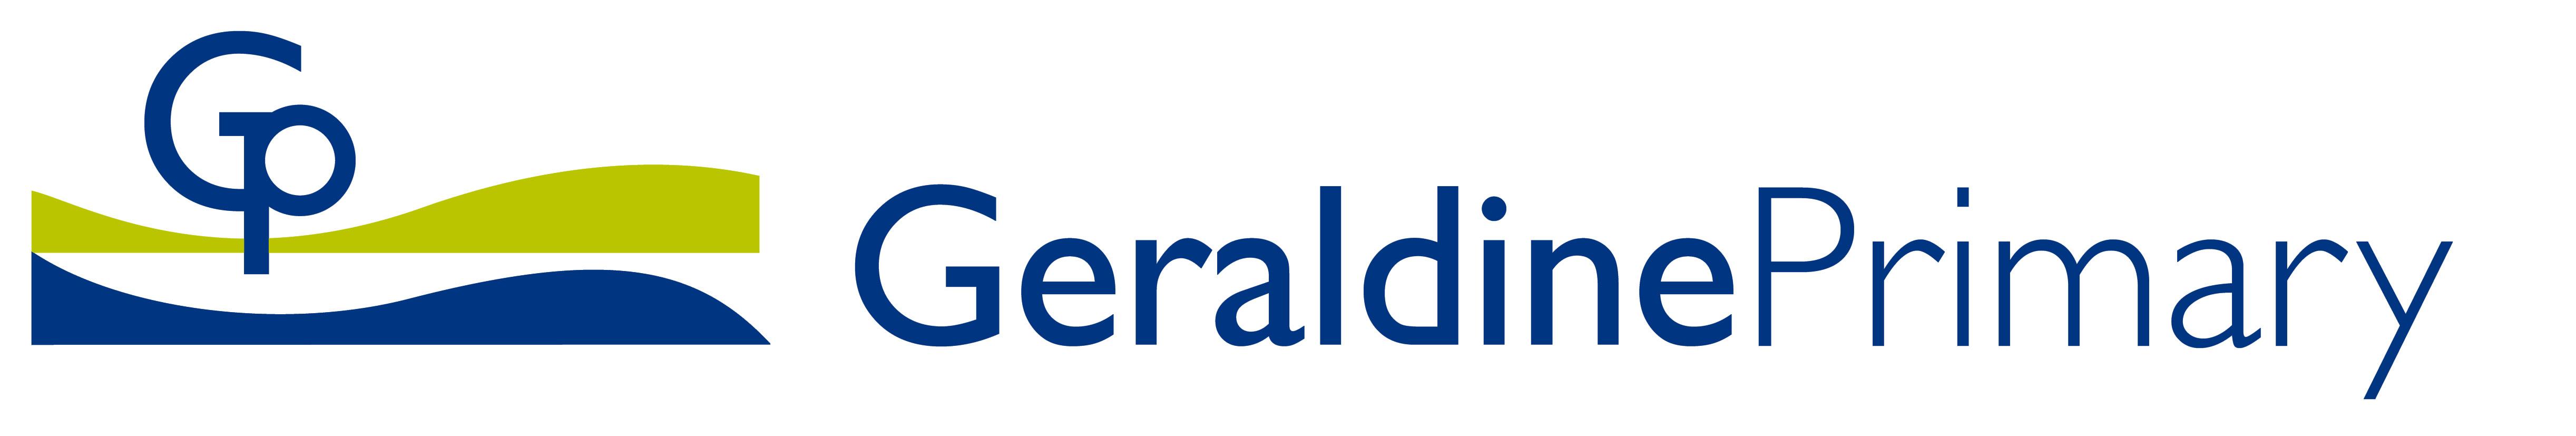 Geraldine Primary logo